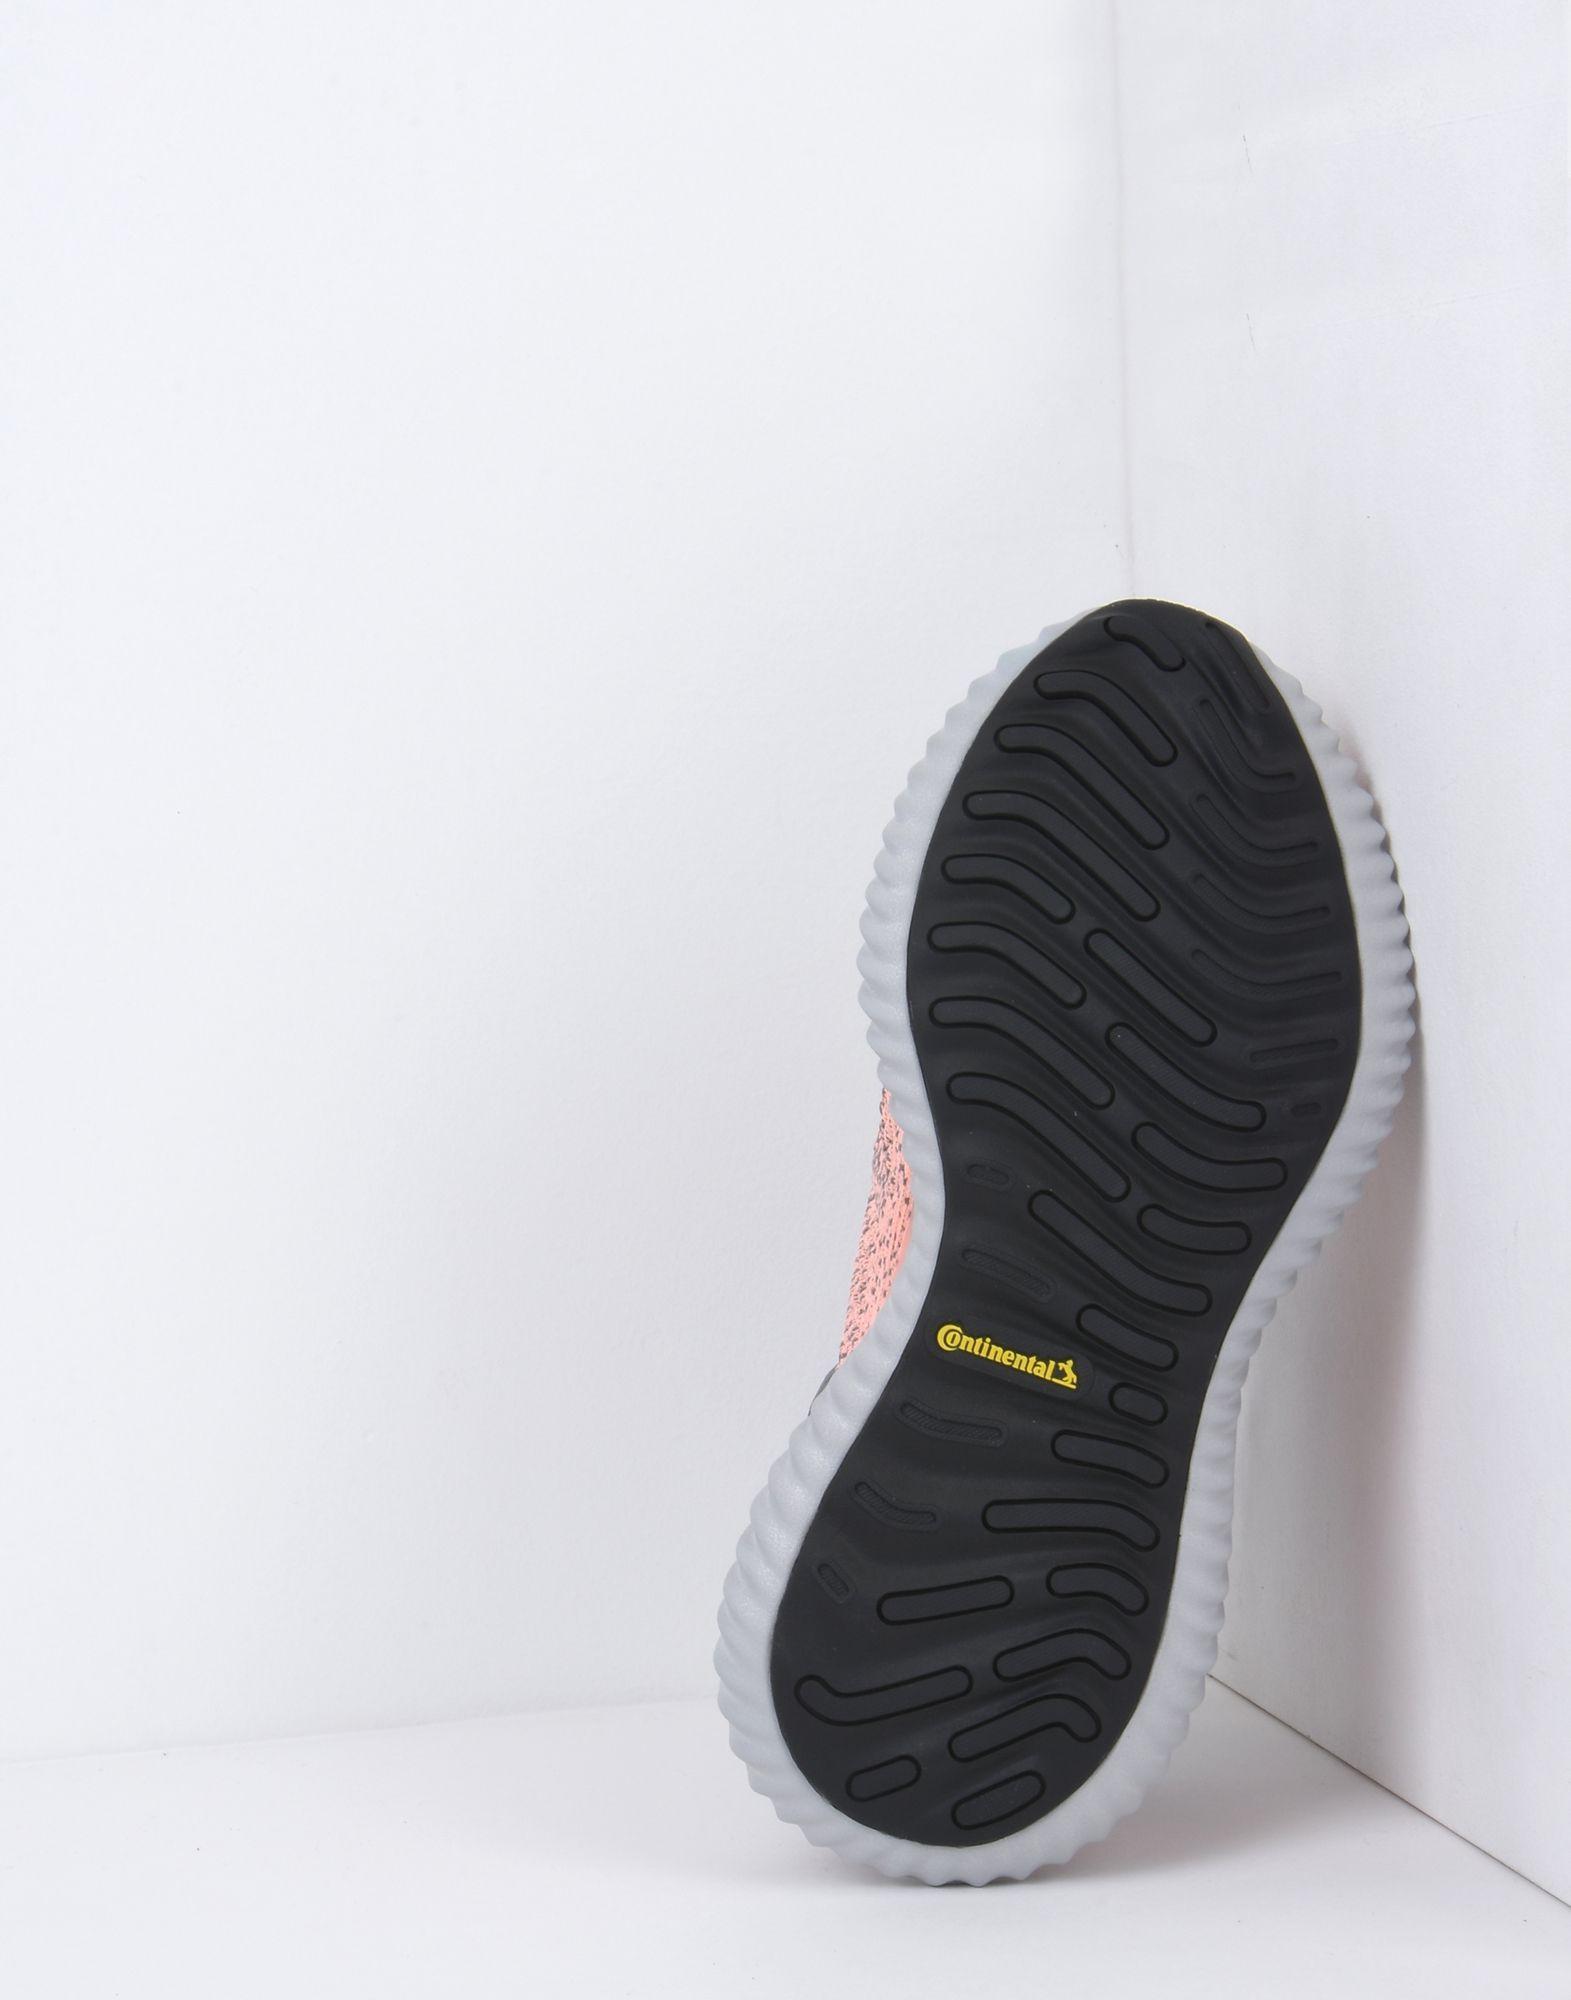 Adidas Beyond Originals Alphabounce Beyond Adidas  11534309BF Gute Qualität beliebte Schuhe 5c5f91